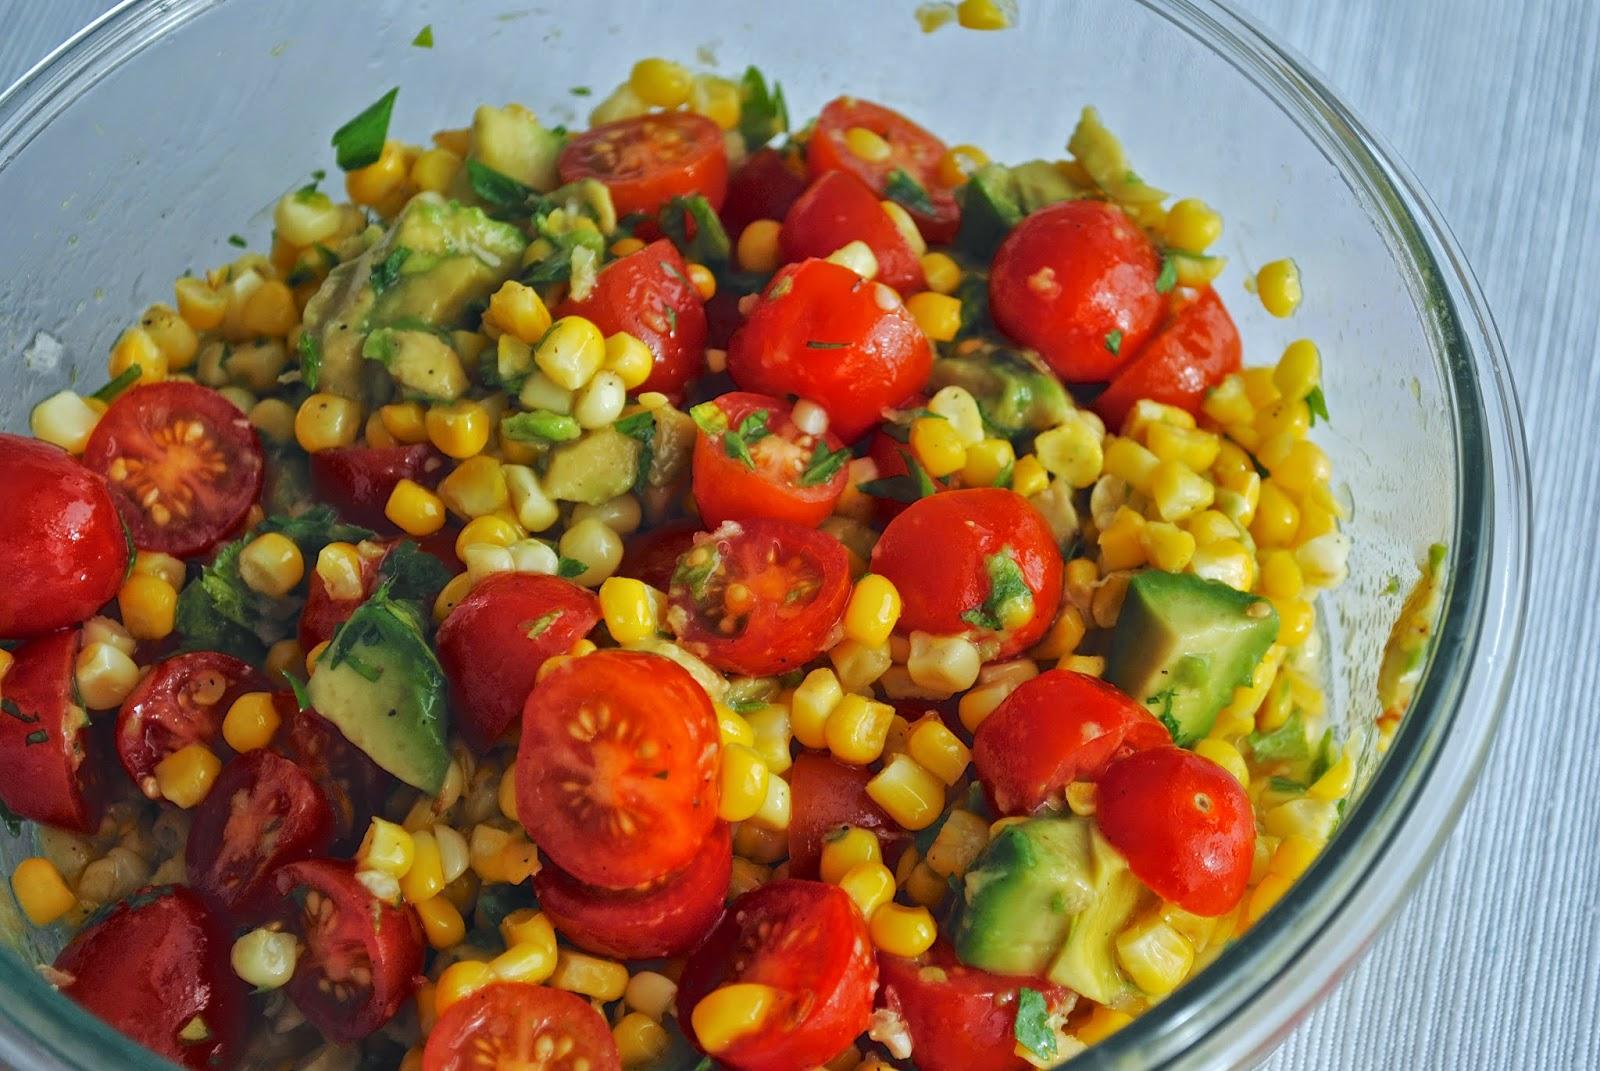 Our Mush Push: Corn, Avocado and Tomato Salad with Honey ...